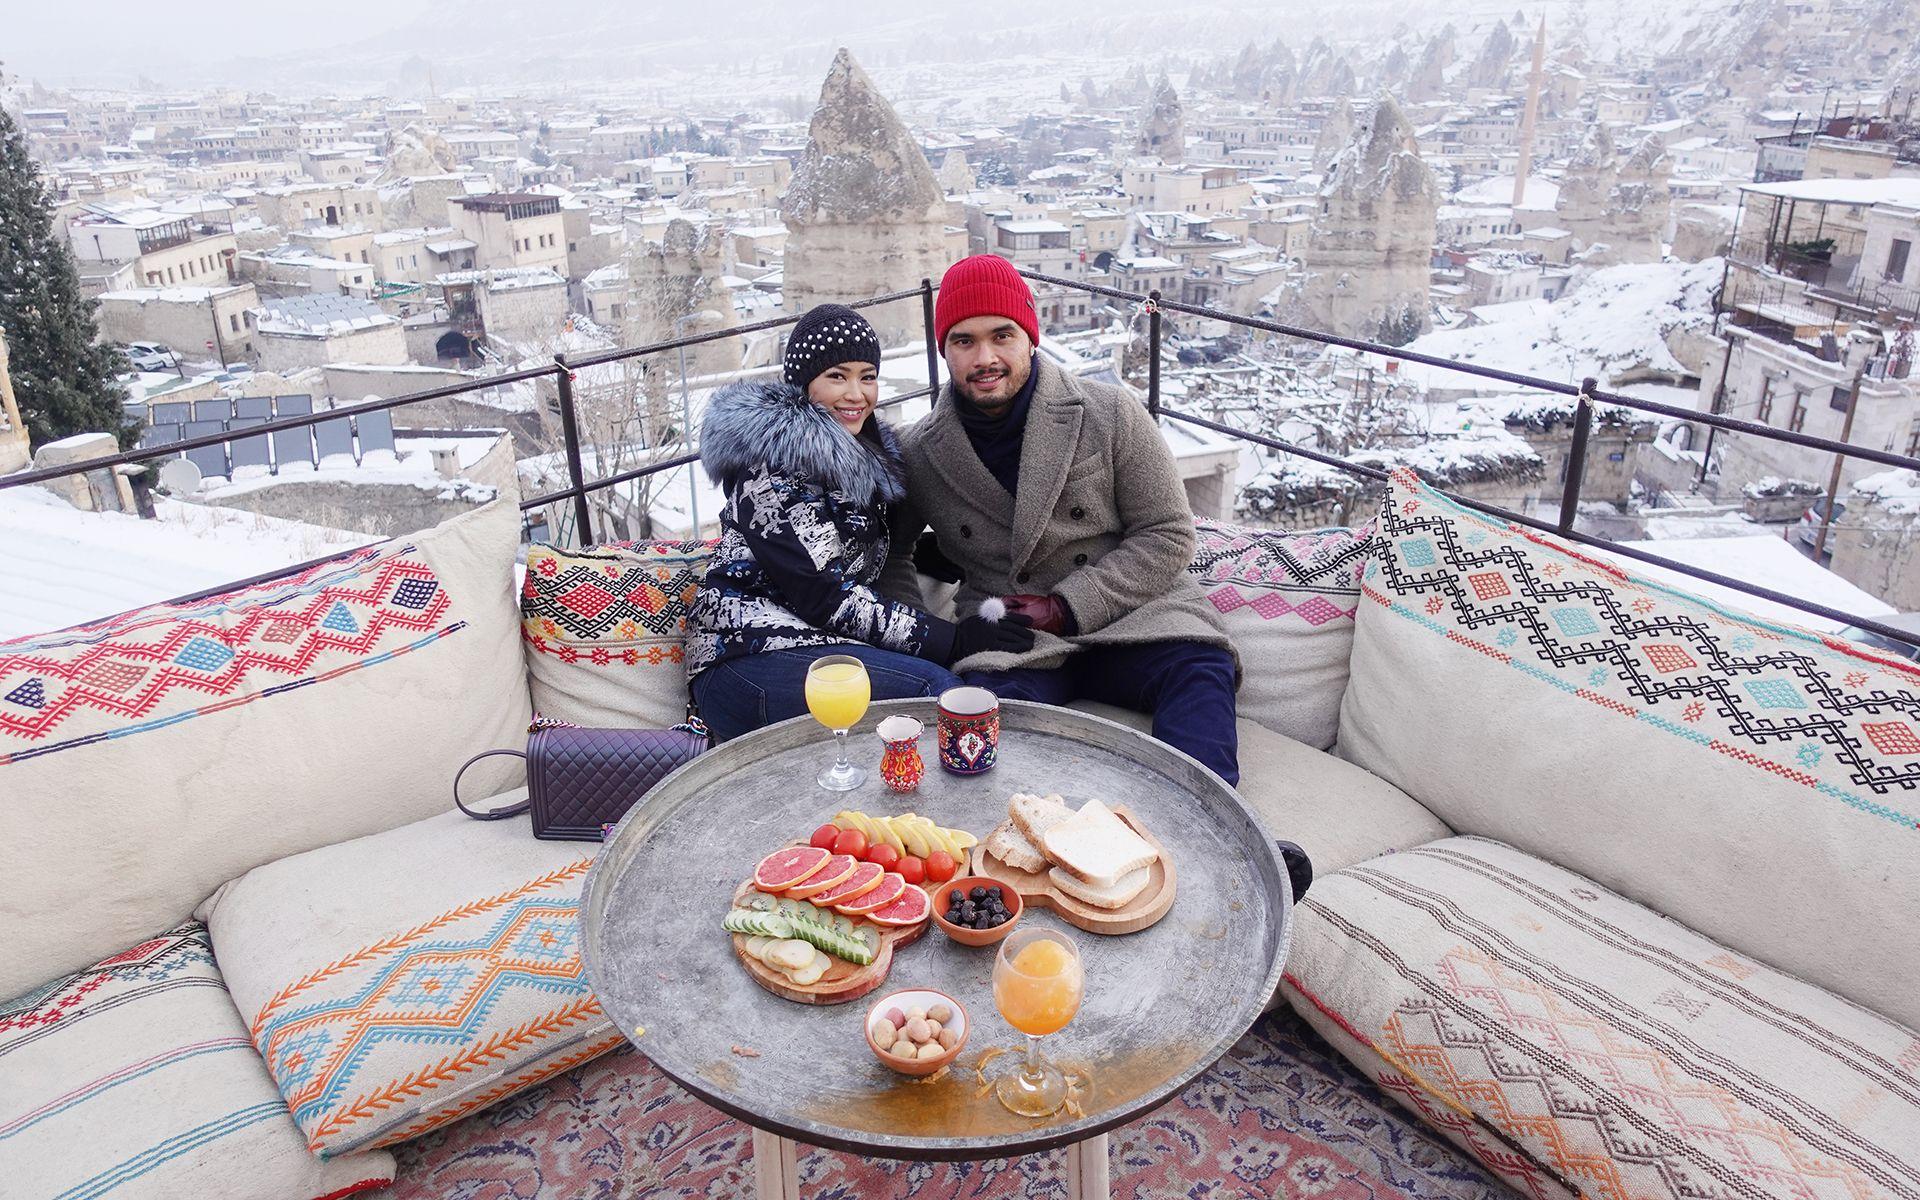 Breakfast with a view, in Cappadocia. (Photo credit: Dr Fazliana Abd Rashid)